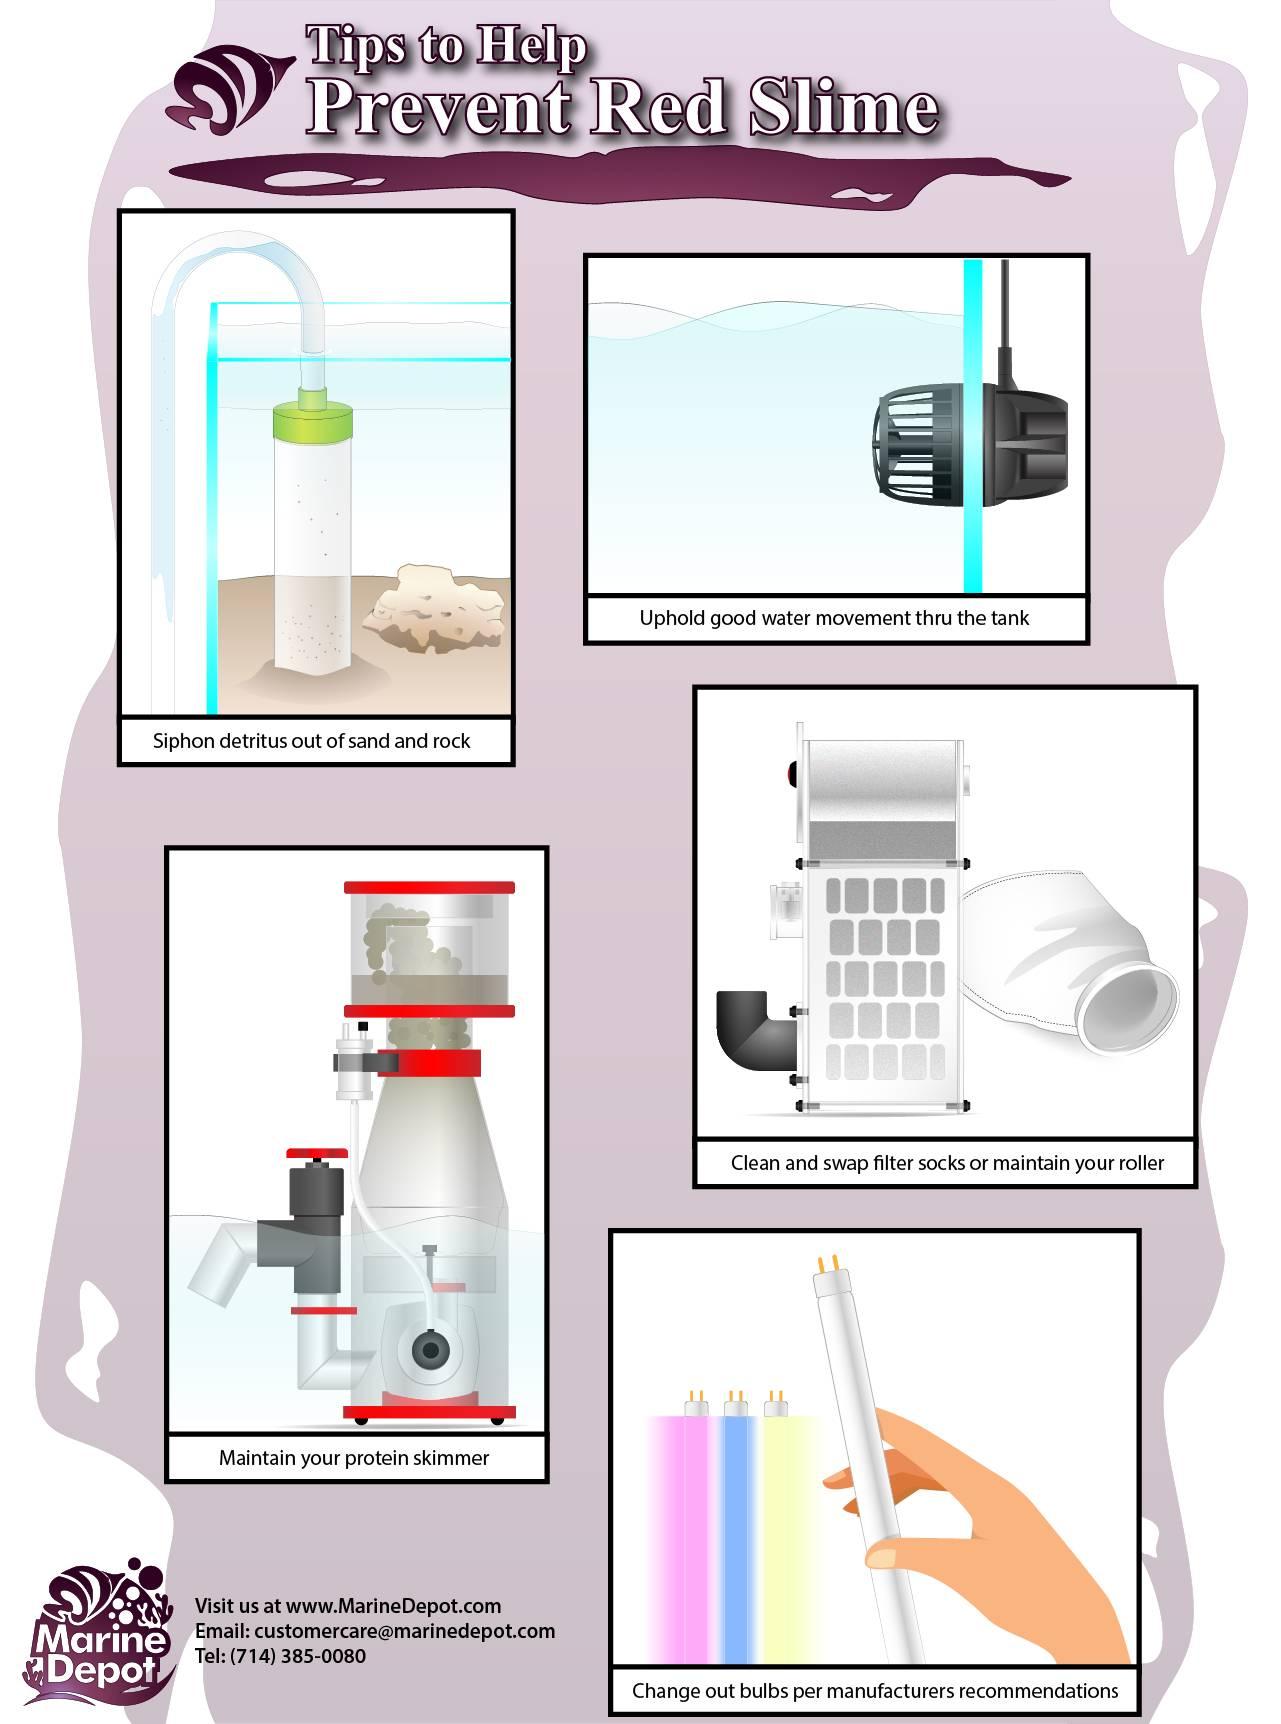 Red slime prevention tips diagram